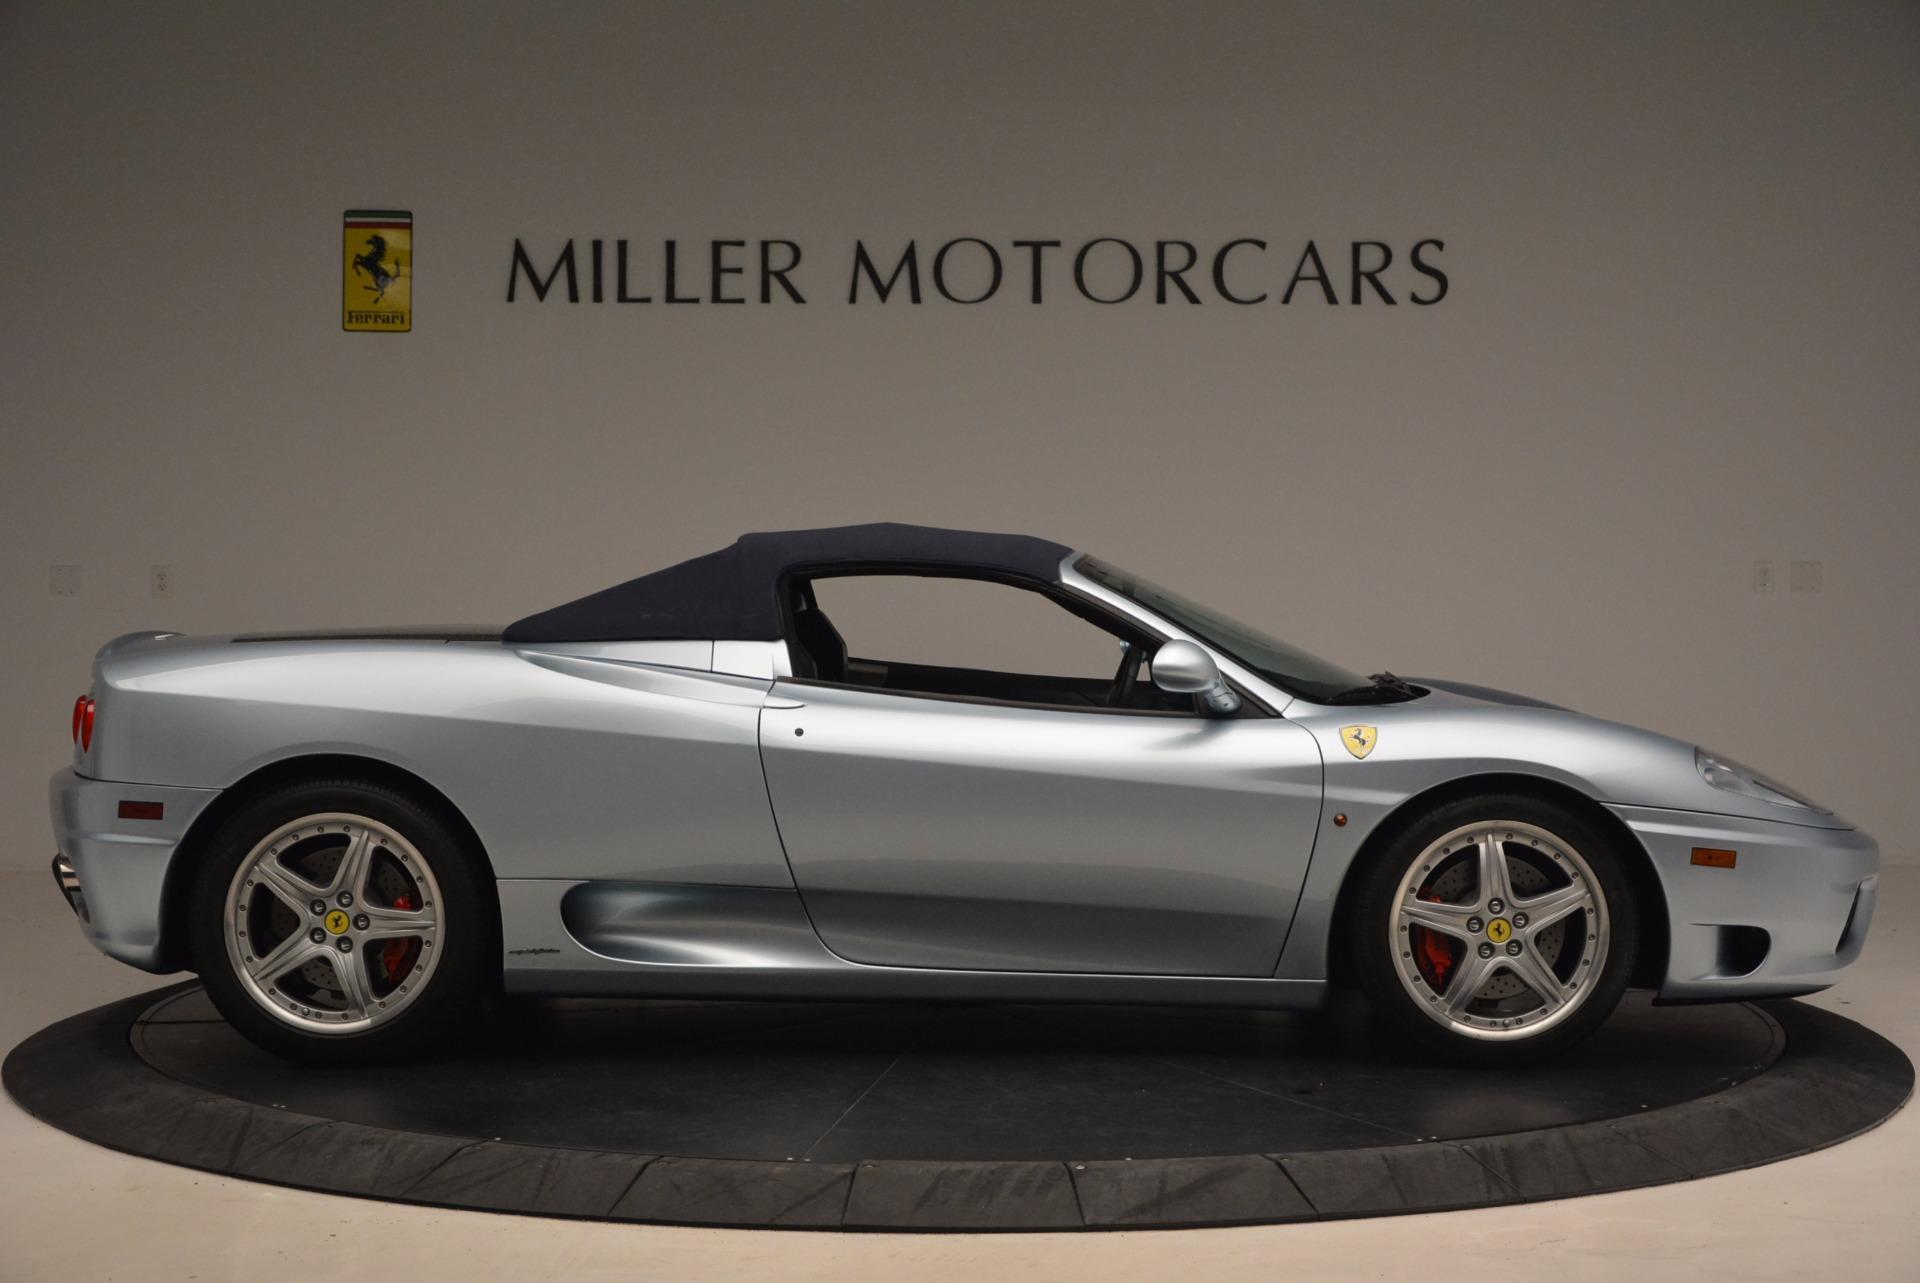 Used 2003 Ferrari 360 Spider 6-Speed Manual For Sale In Westport, CT 1445_p21